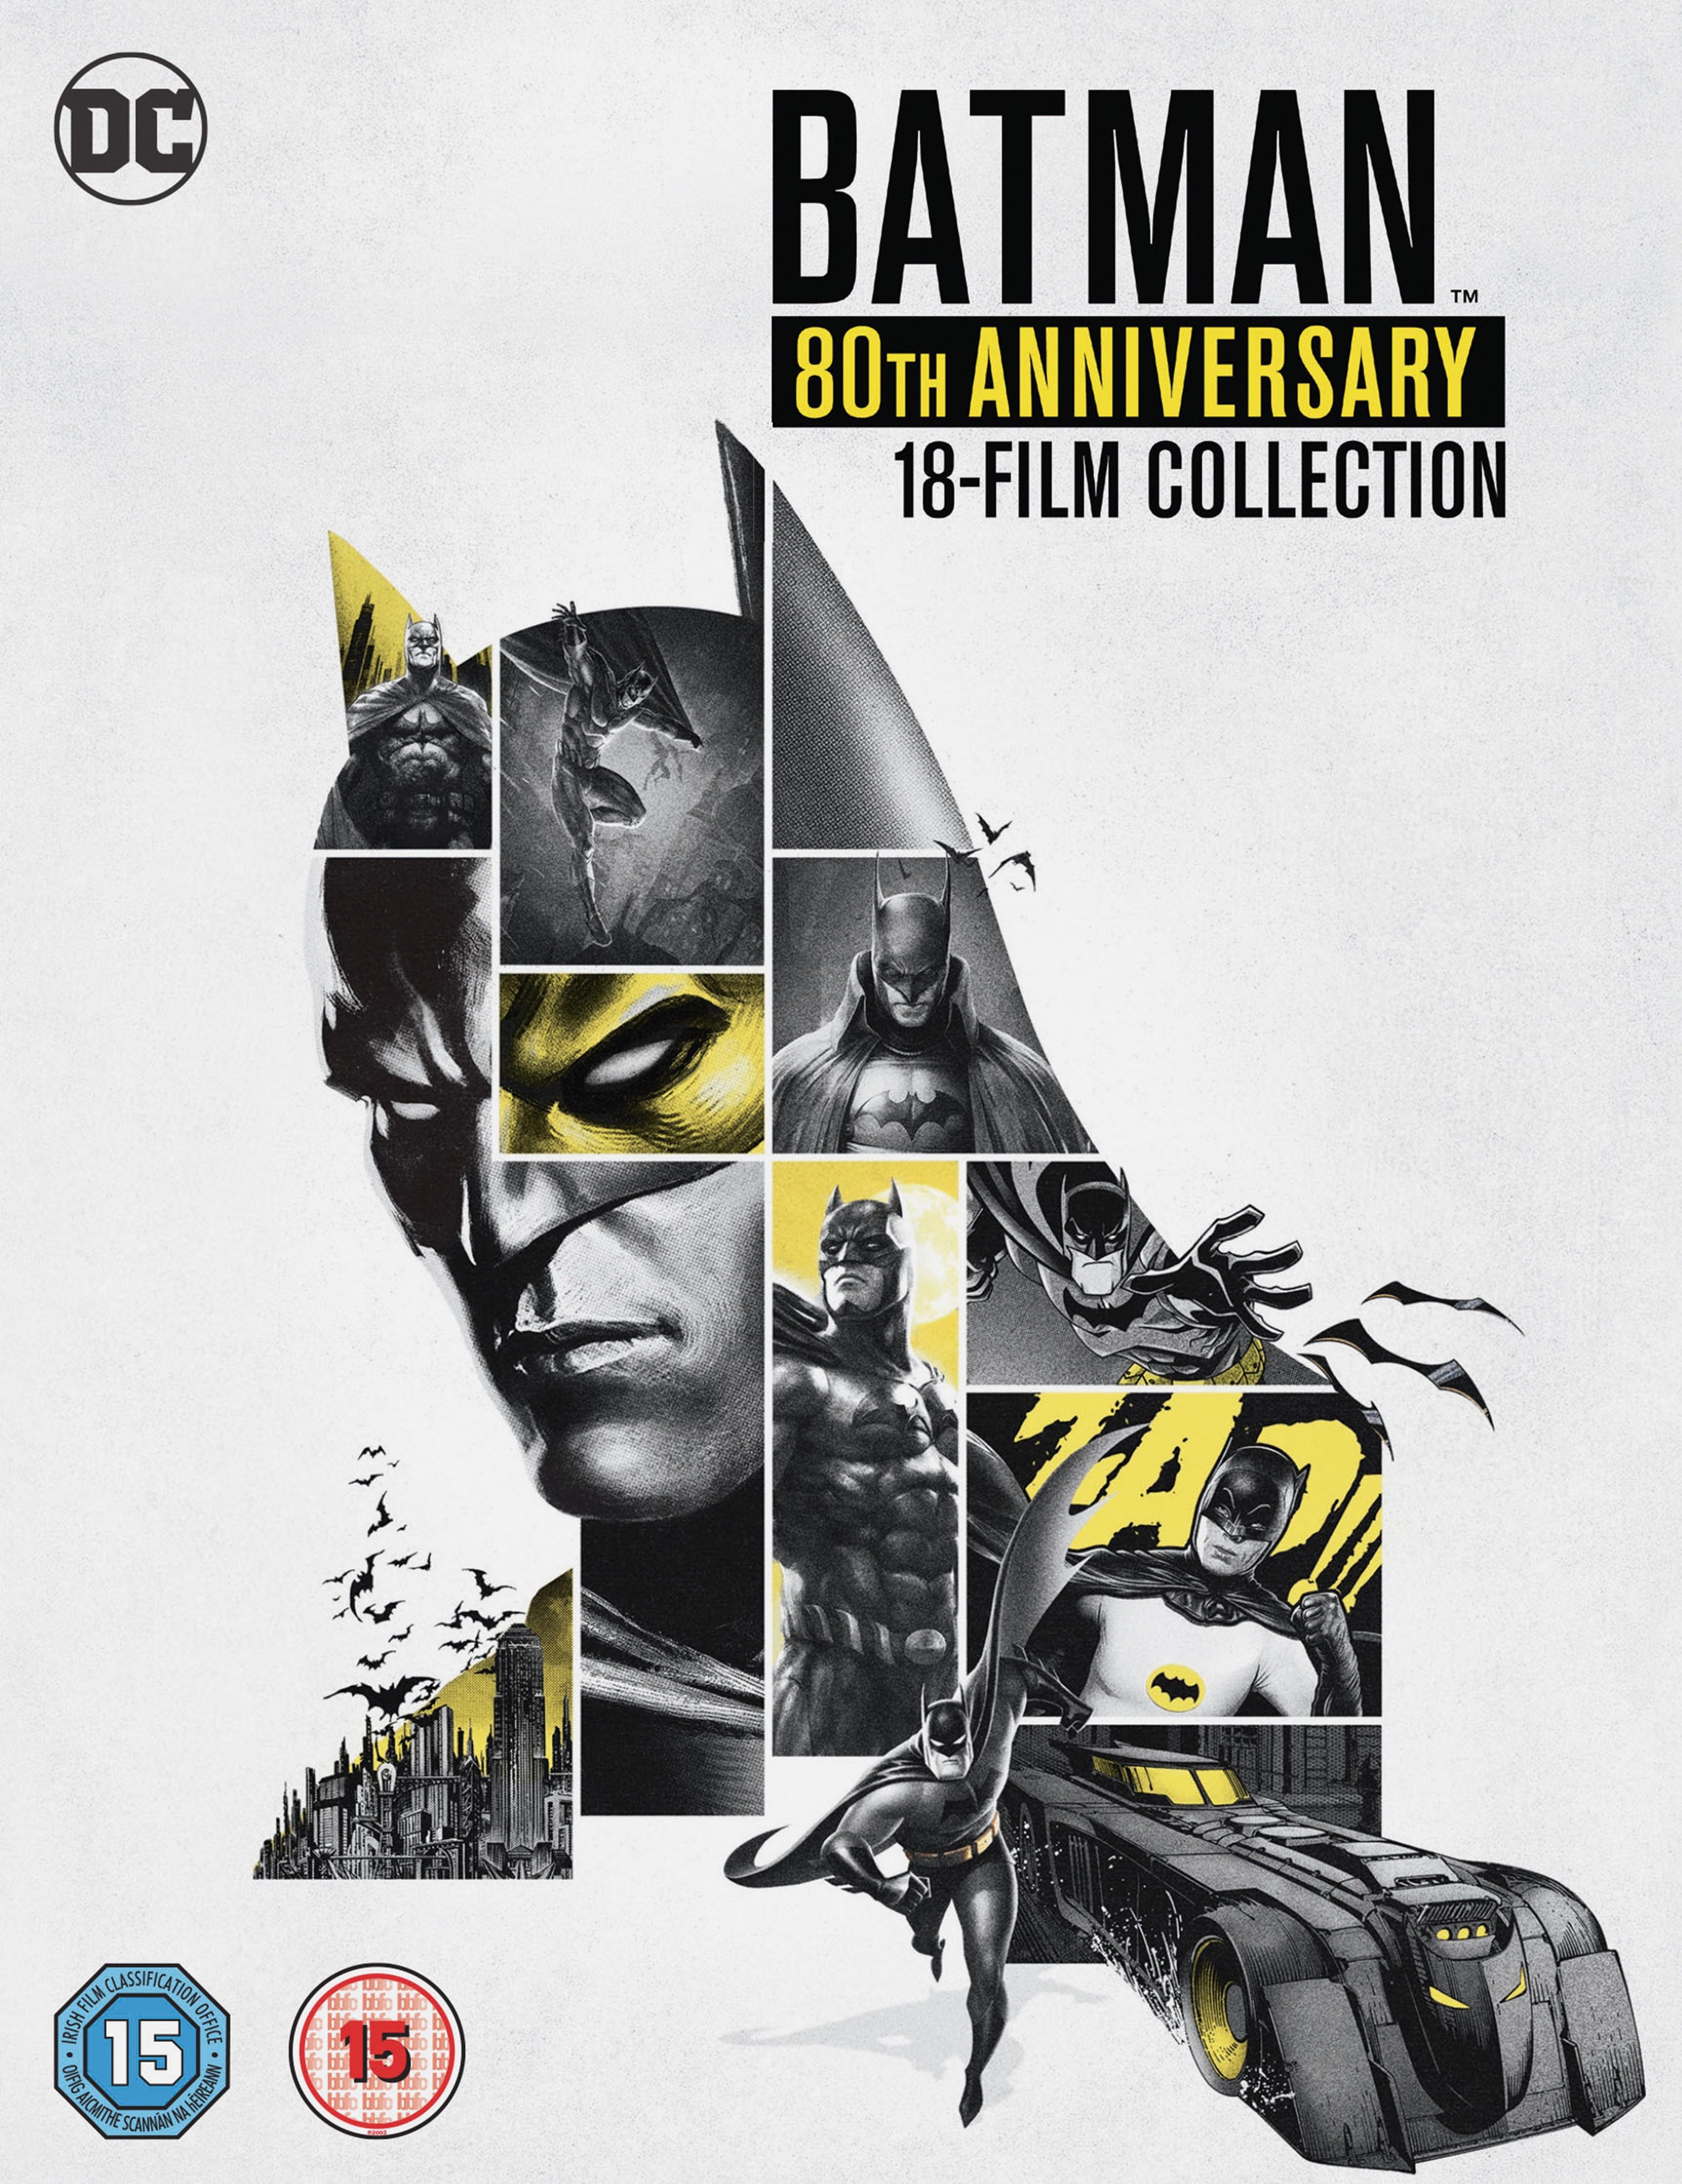 Batman: 80th Anniversary 18-film Collection - 1